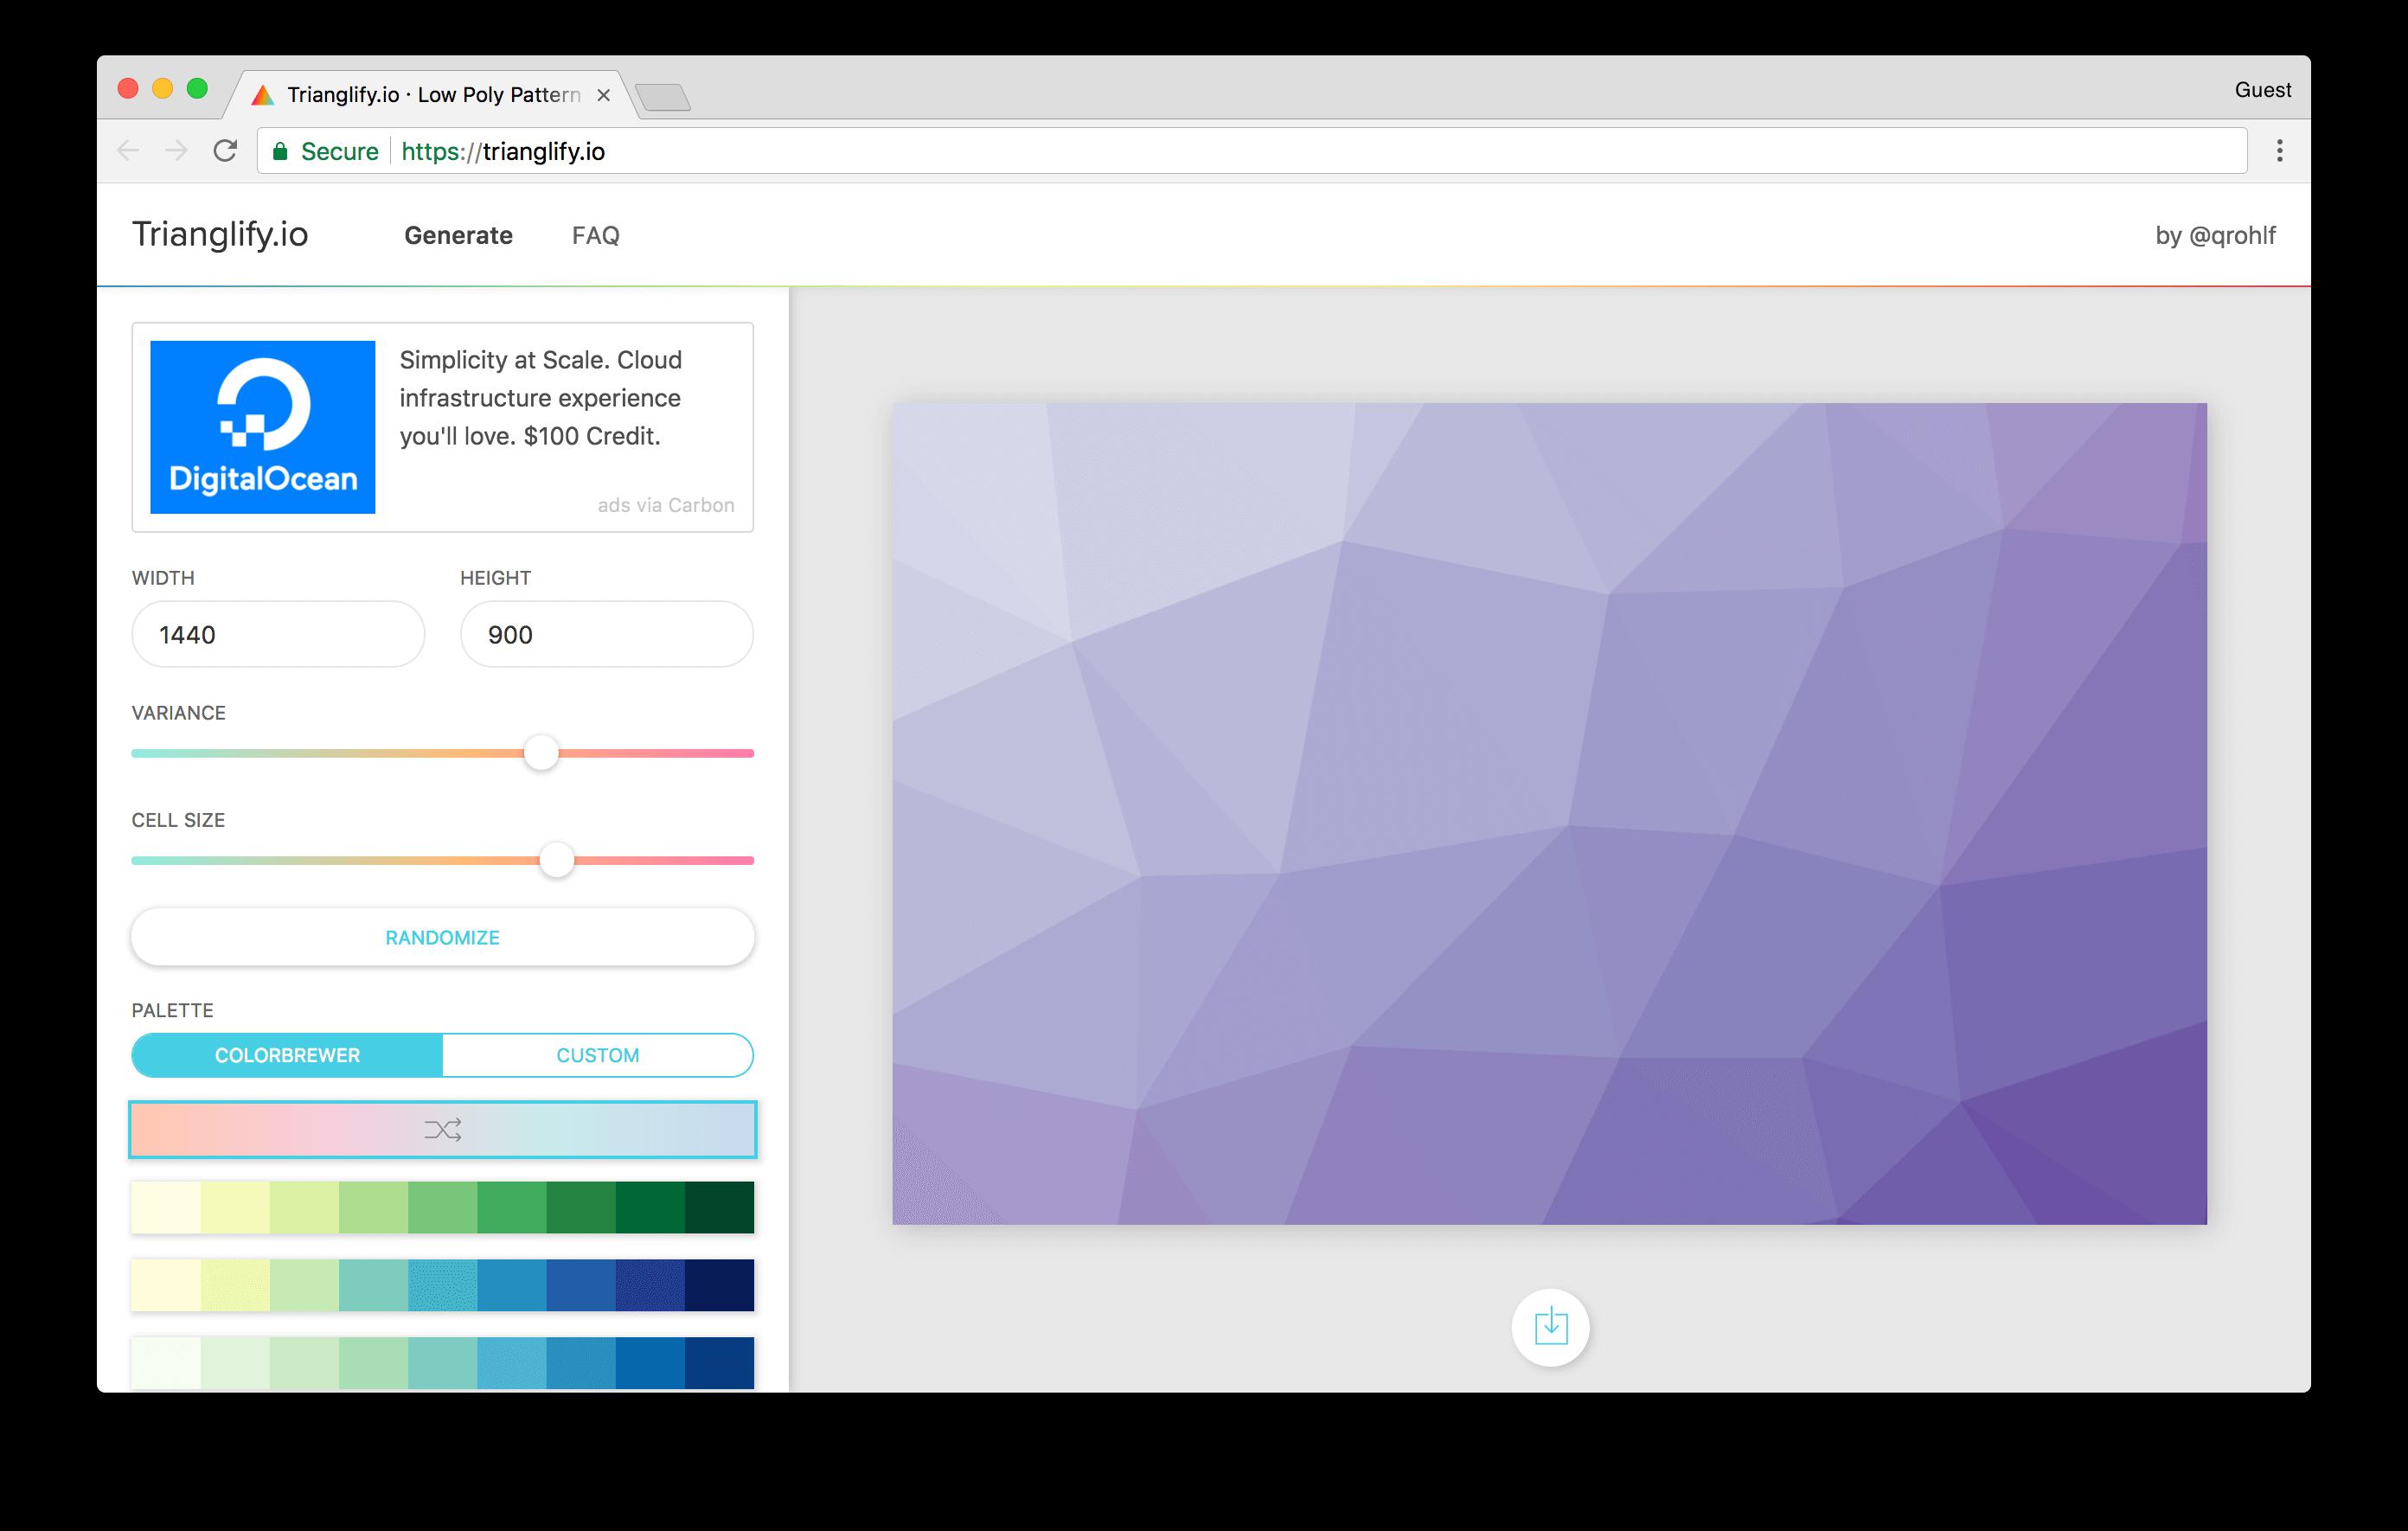 qrohlf.com/trianglify-generator